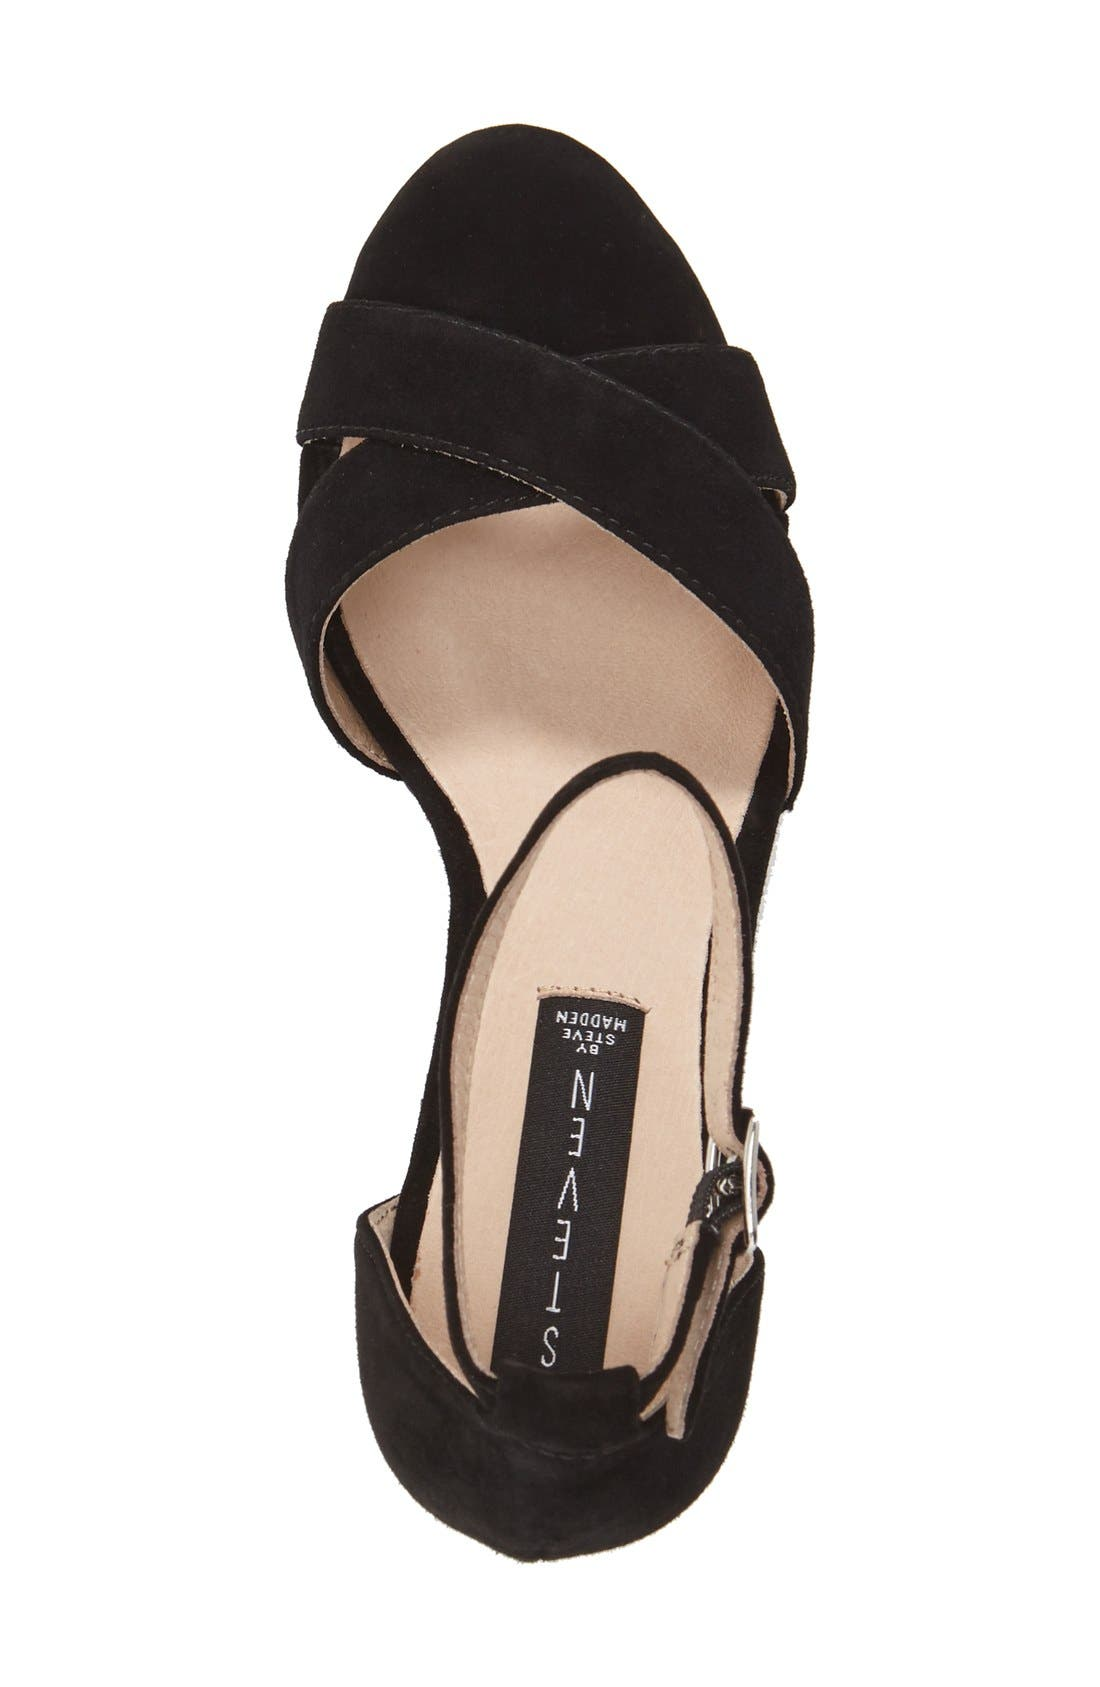 'Voomme' Ankle Strap Sandal,                             Alternate thumbnail 9, color,